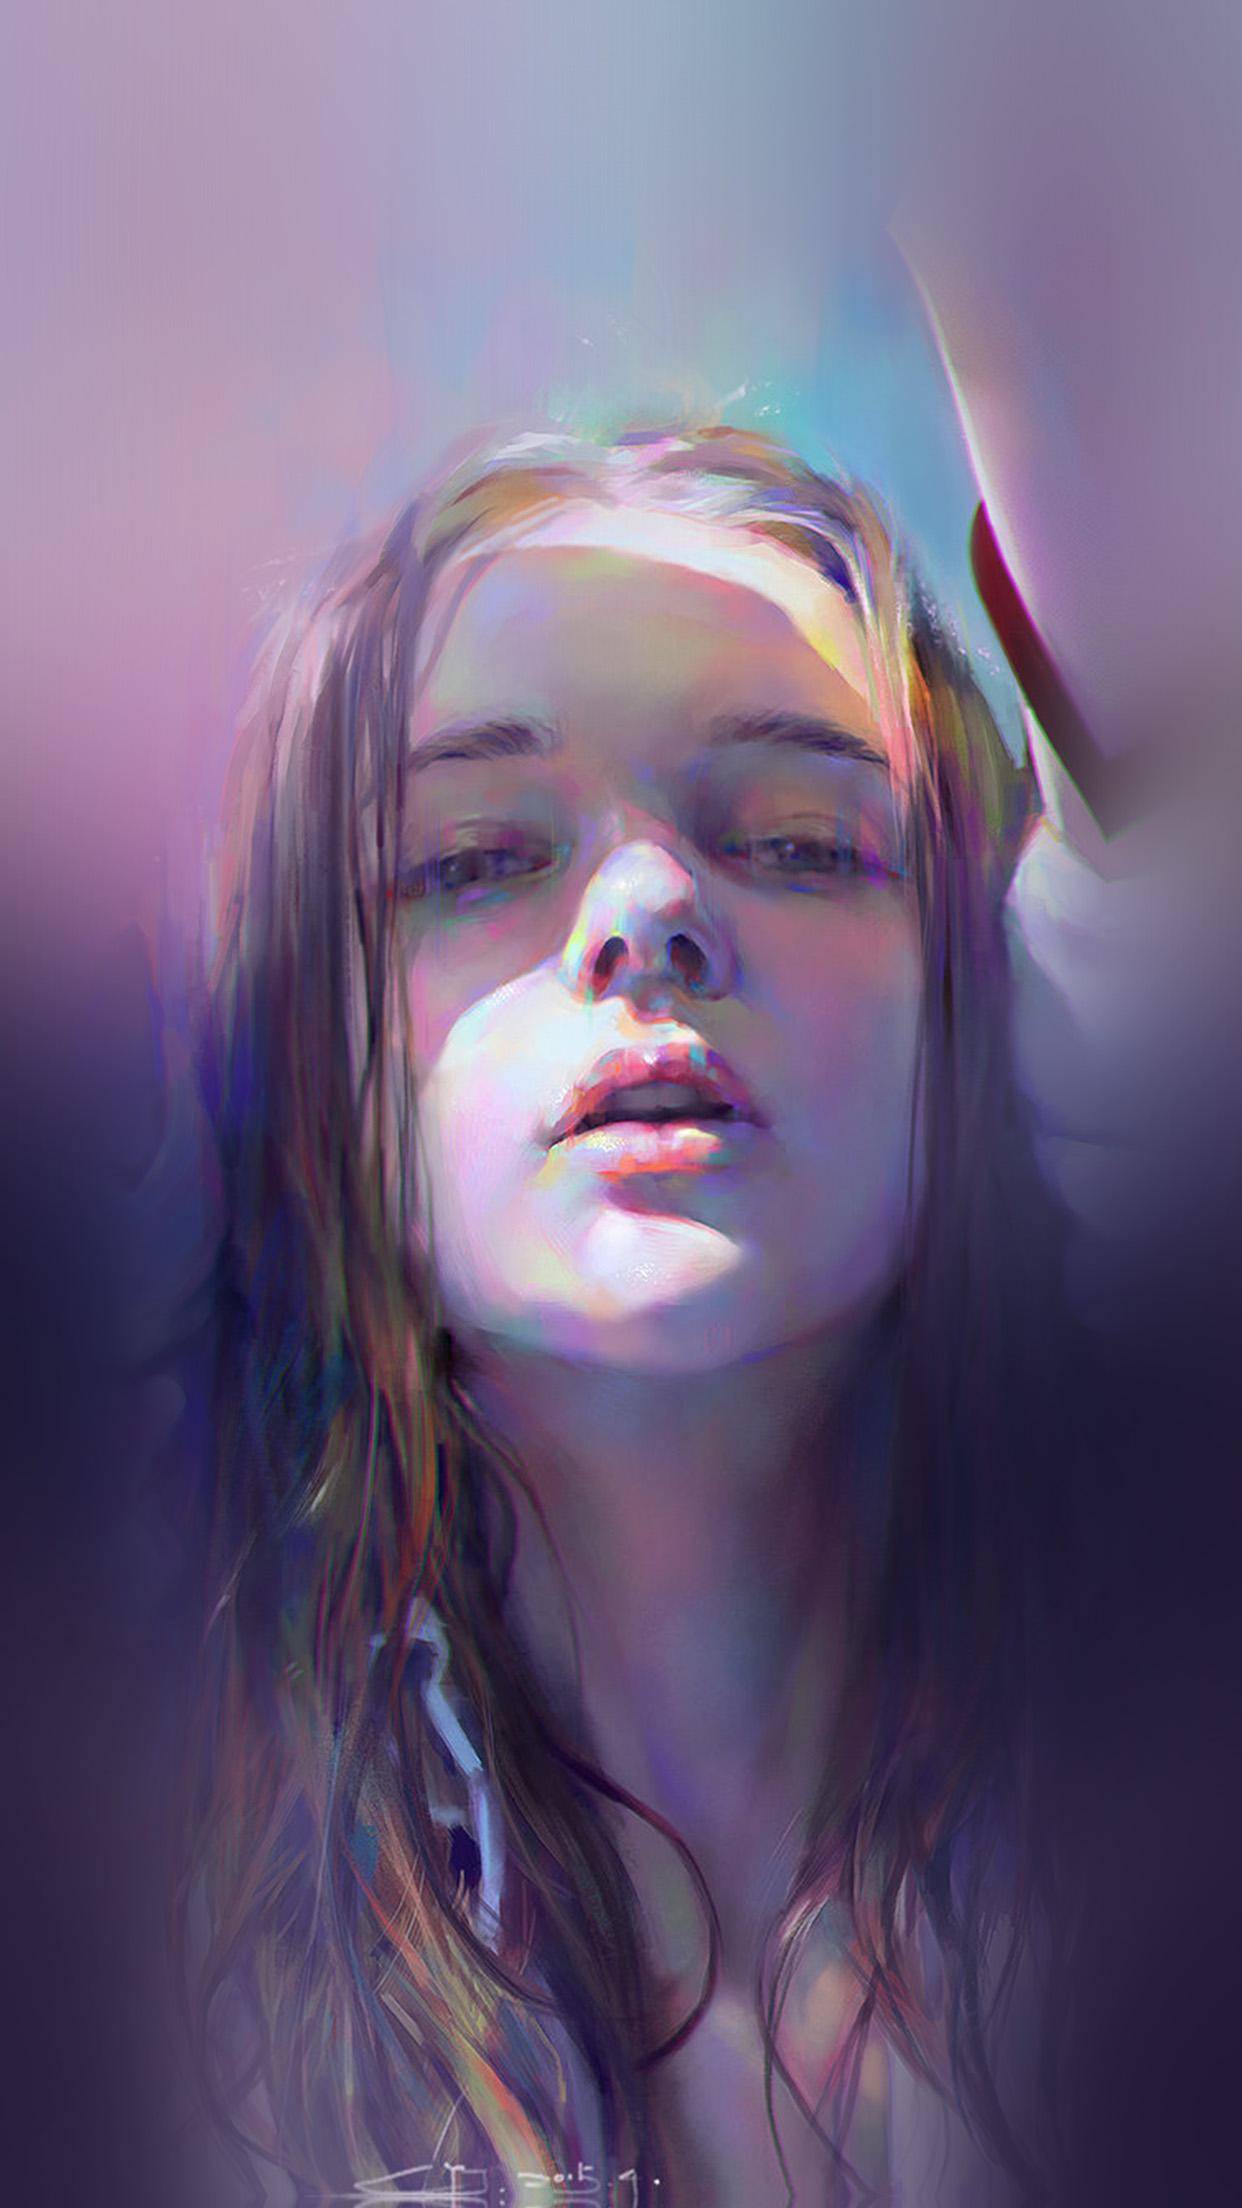 Iphone6papers Com Iphone 6 Wallpaper Ba07 Girl Anime Purple Illustration Art